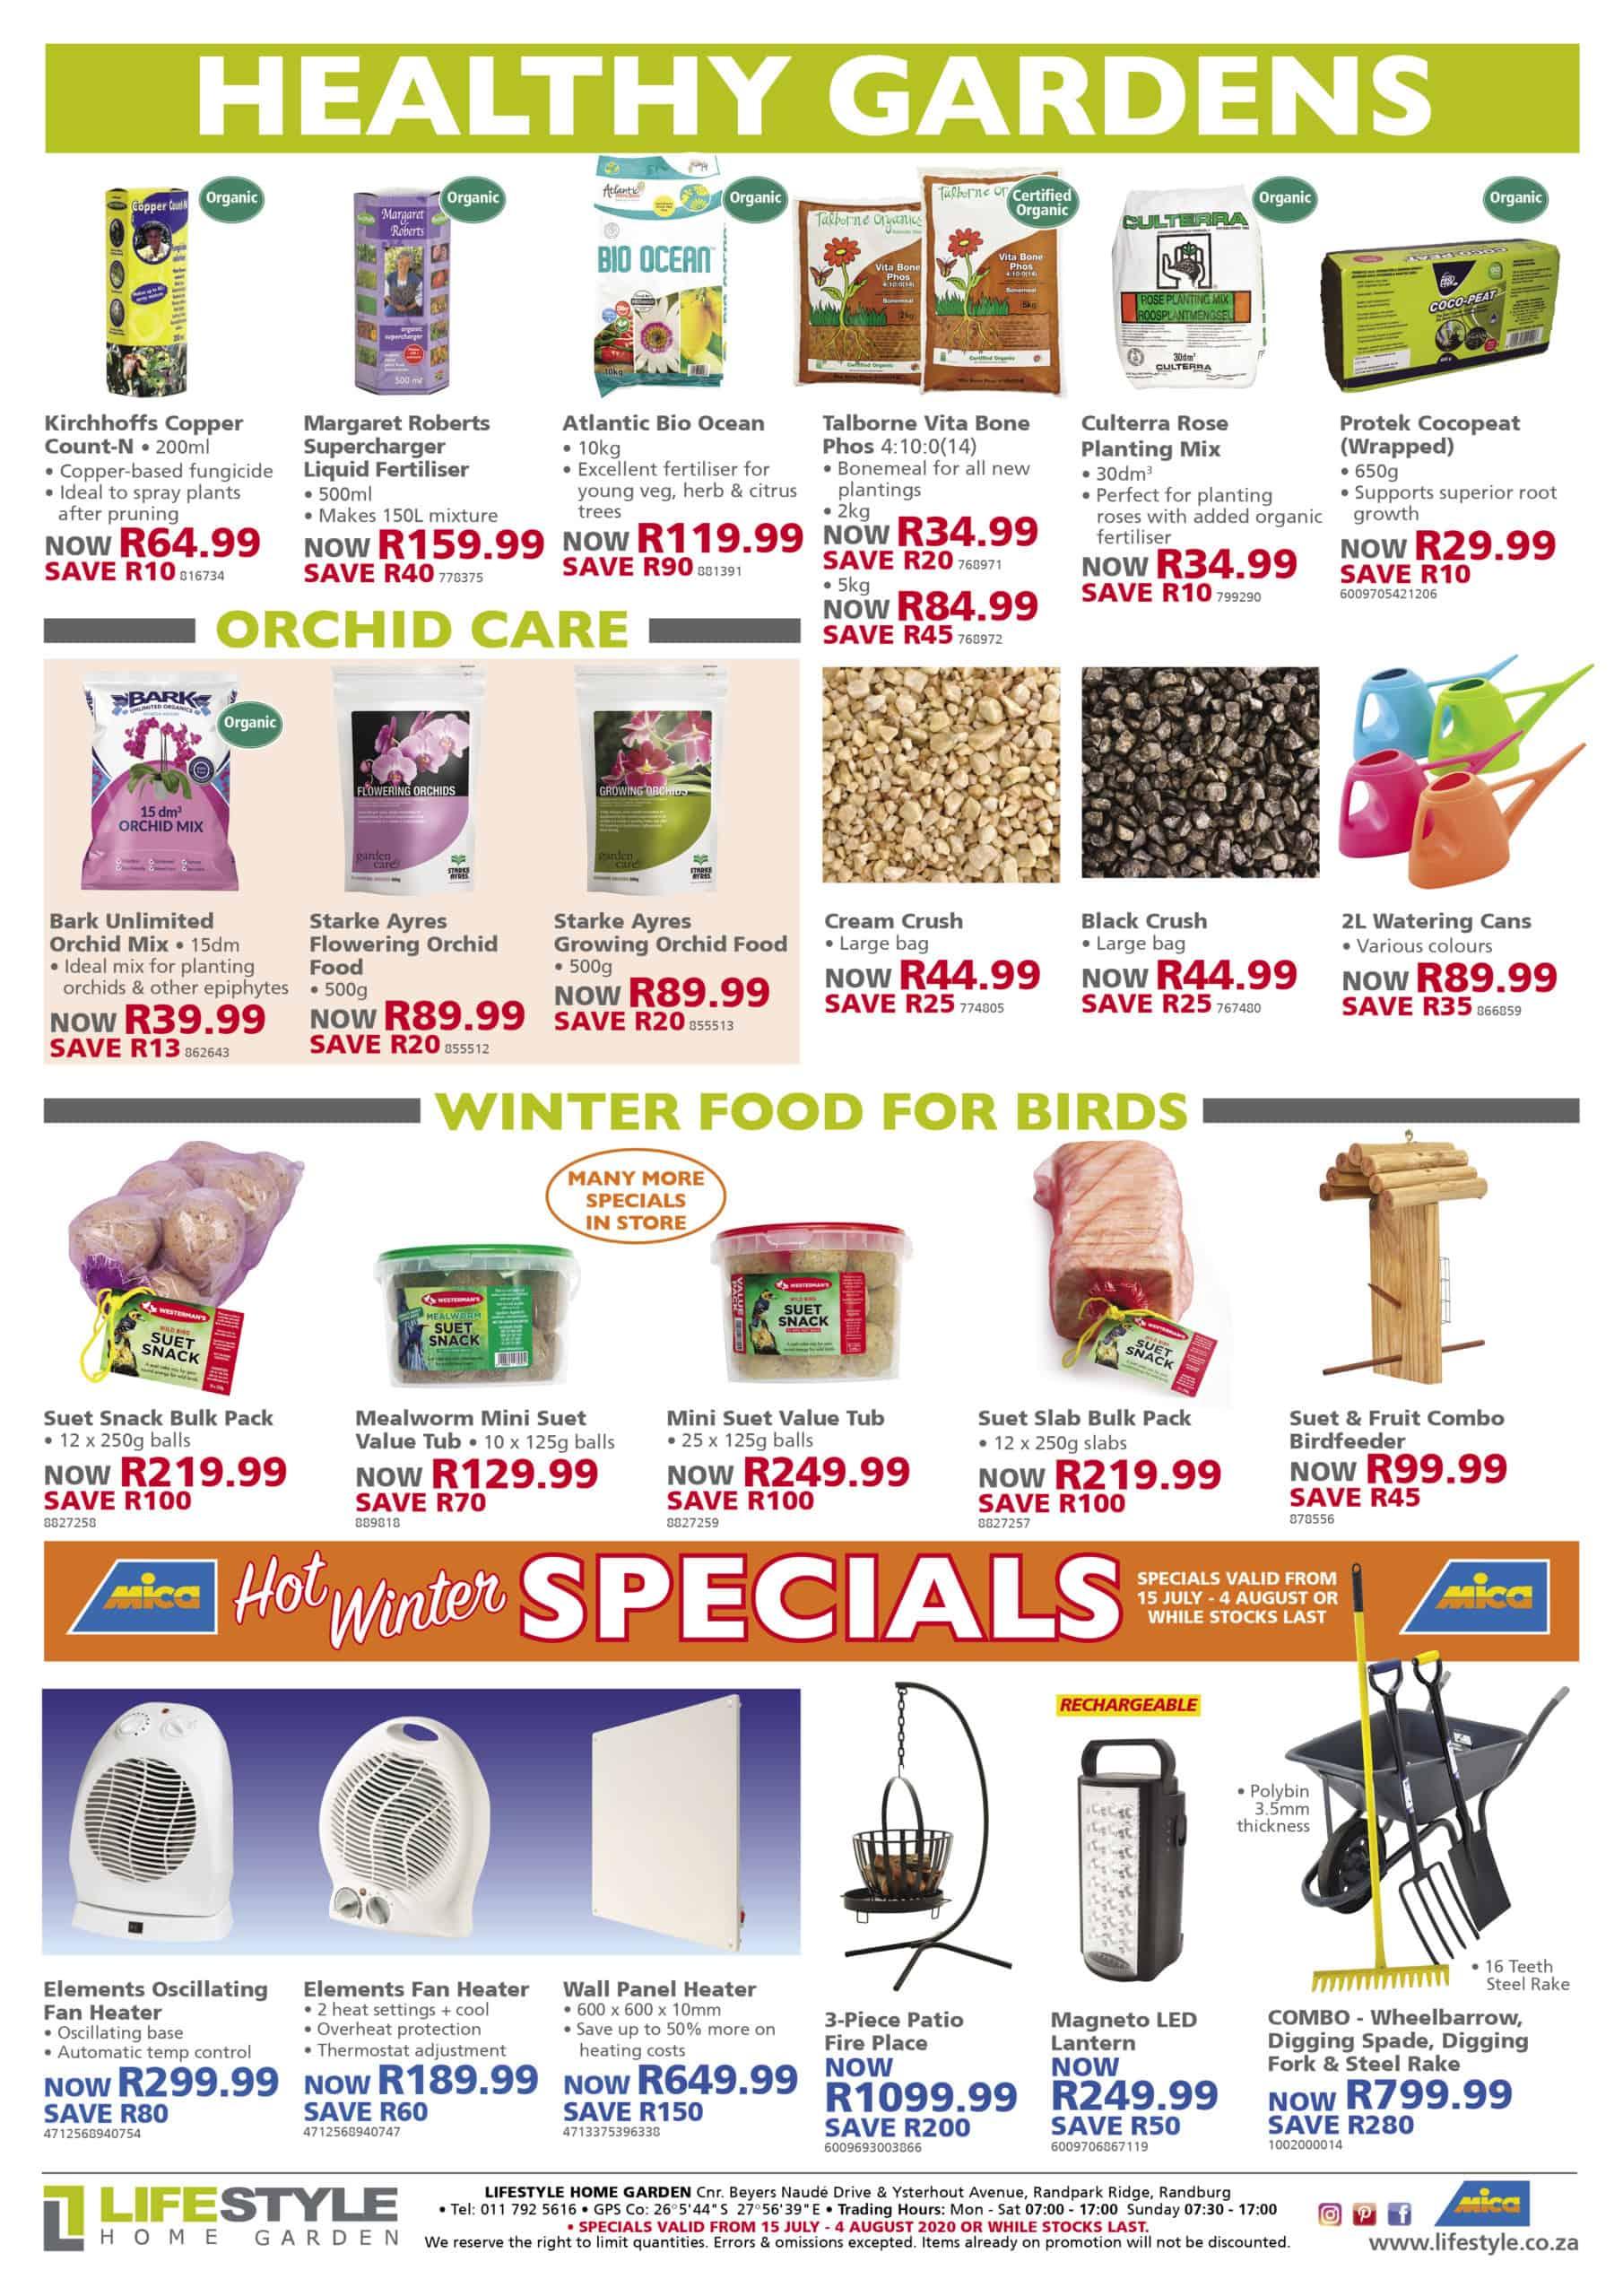 lifestyle home garden leaflet specials winter johannesburg colour flowers gauteng nursery plant shop